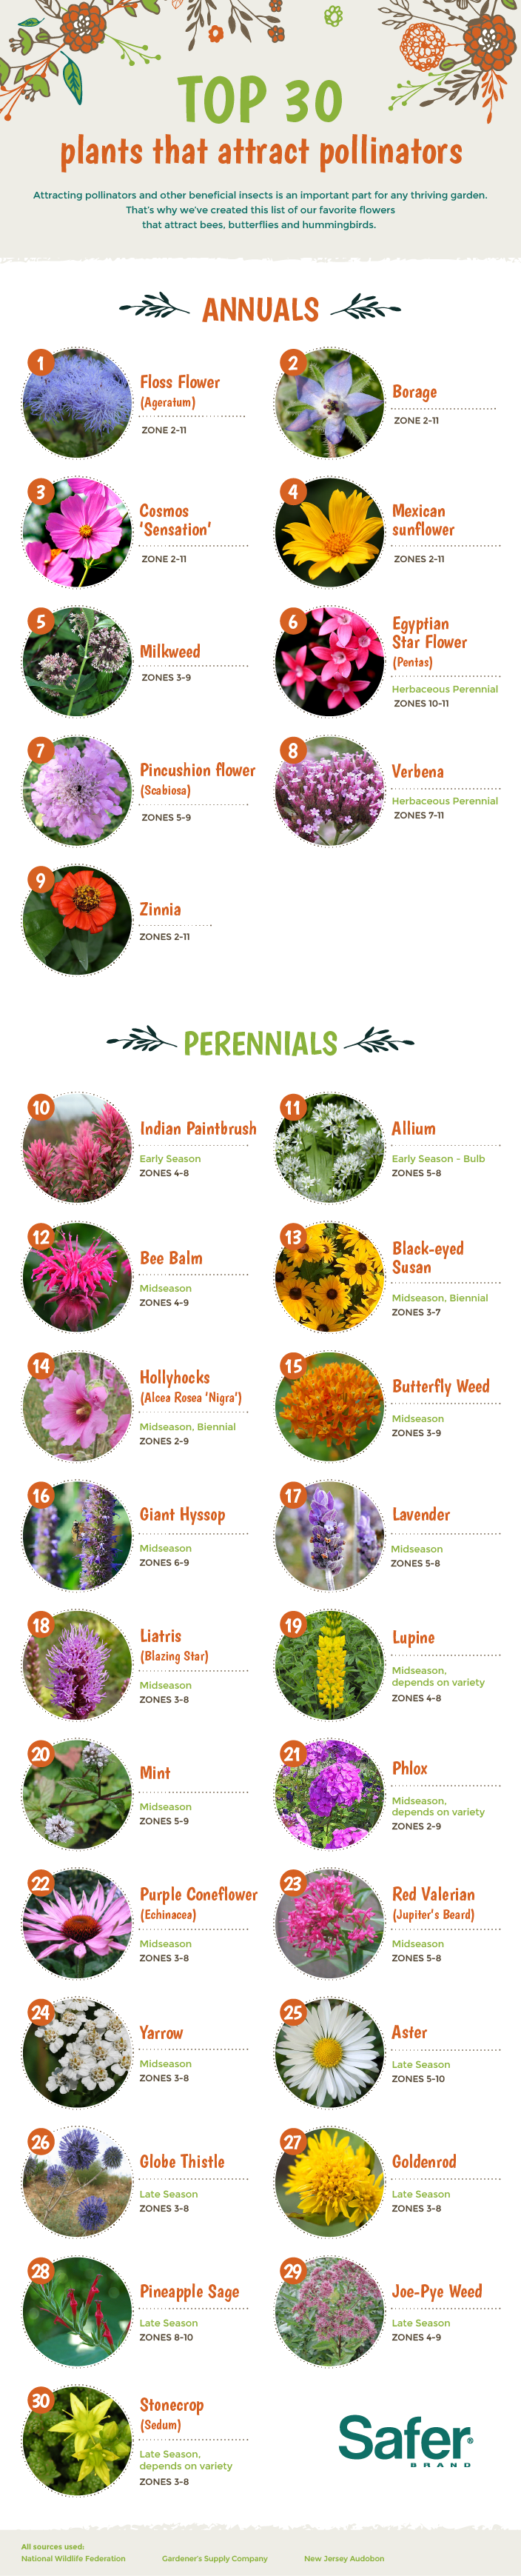 Top 30 Plants That Attract Pollinators Pollinator Plants Pollinator Garden Pollination